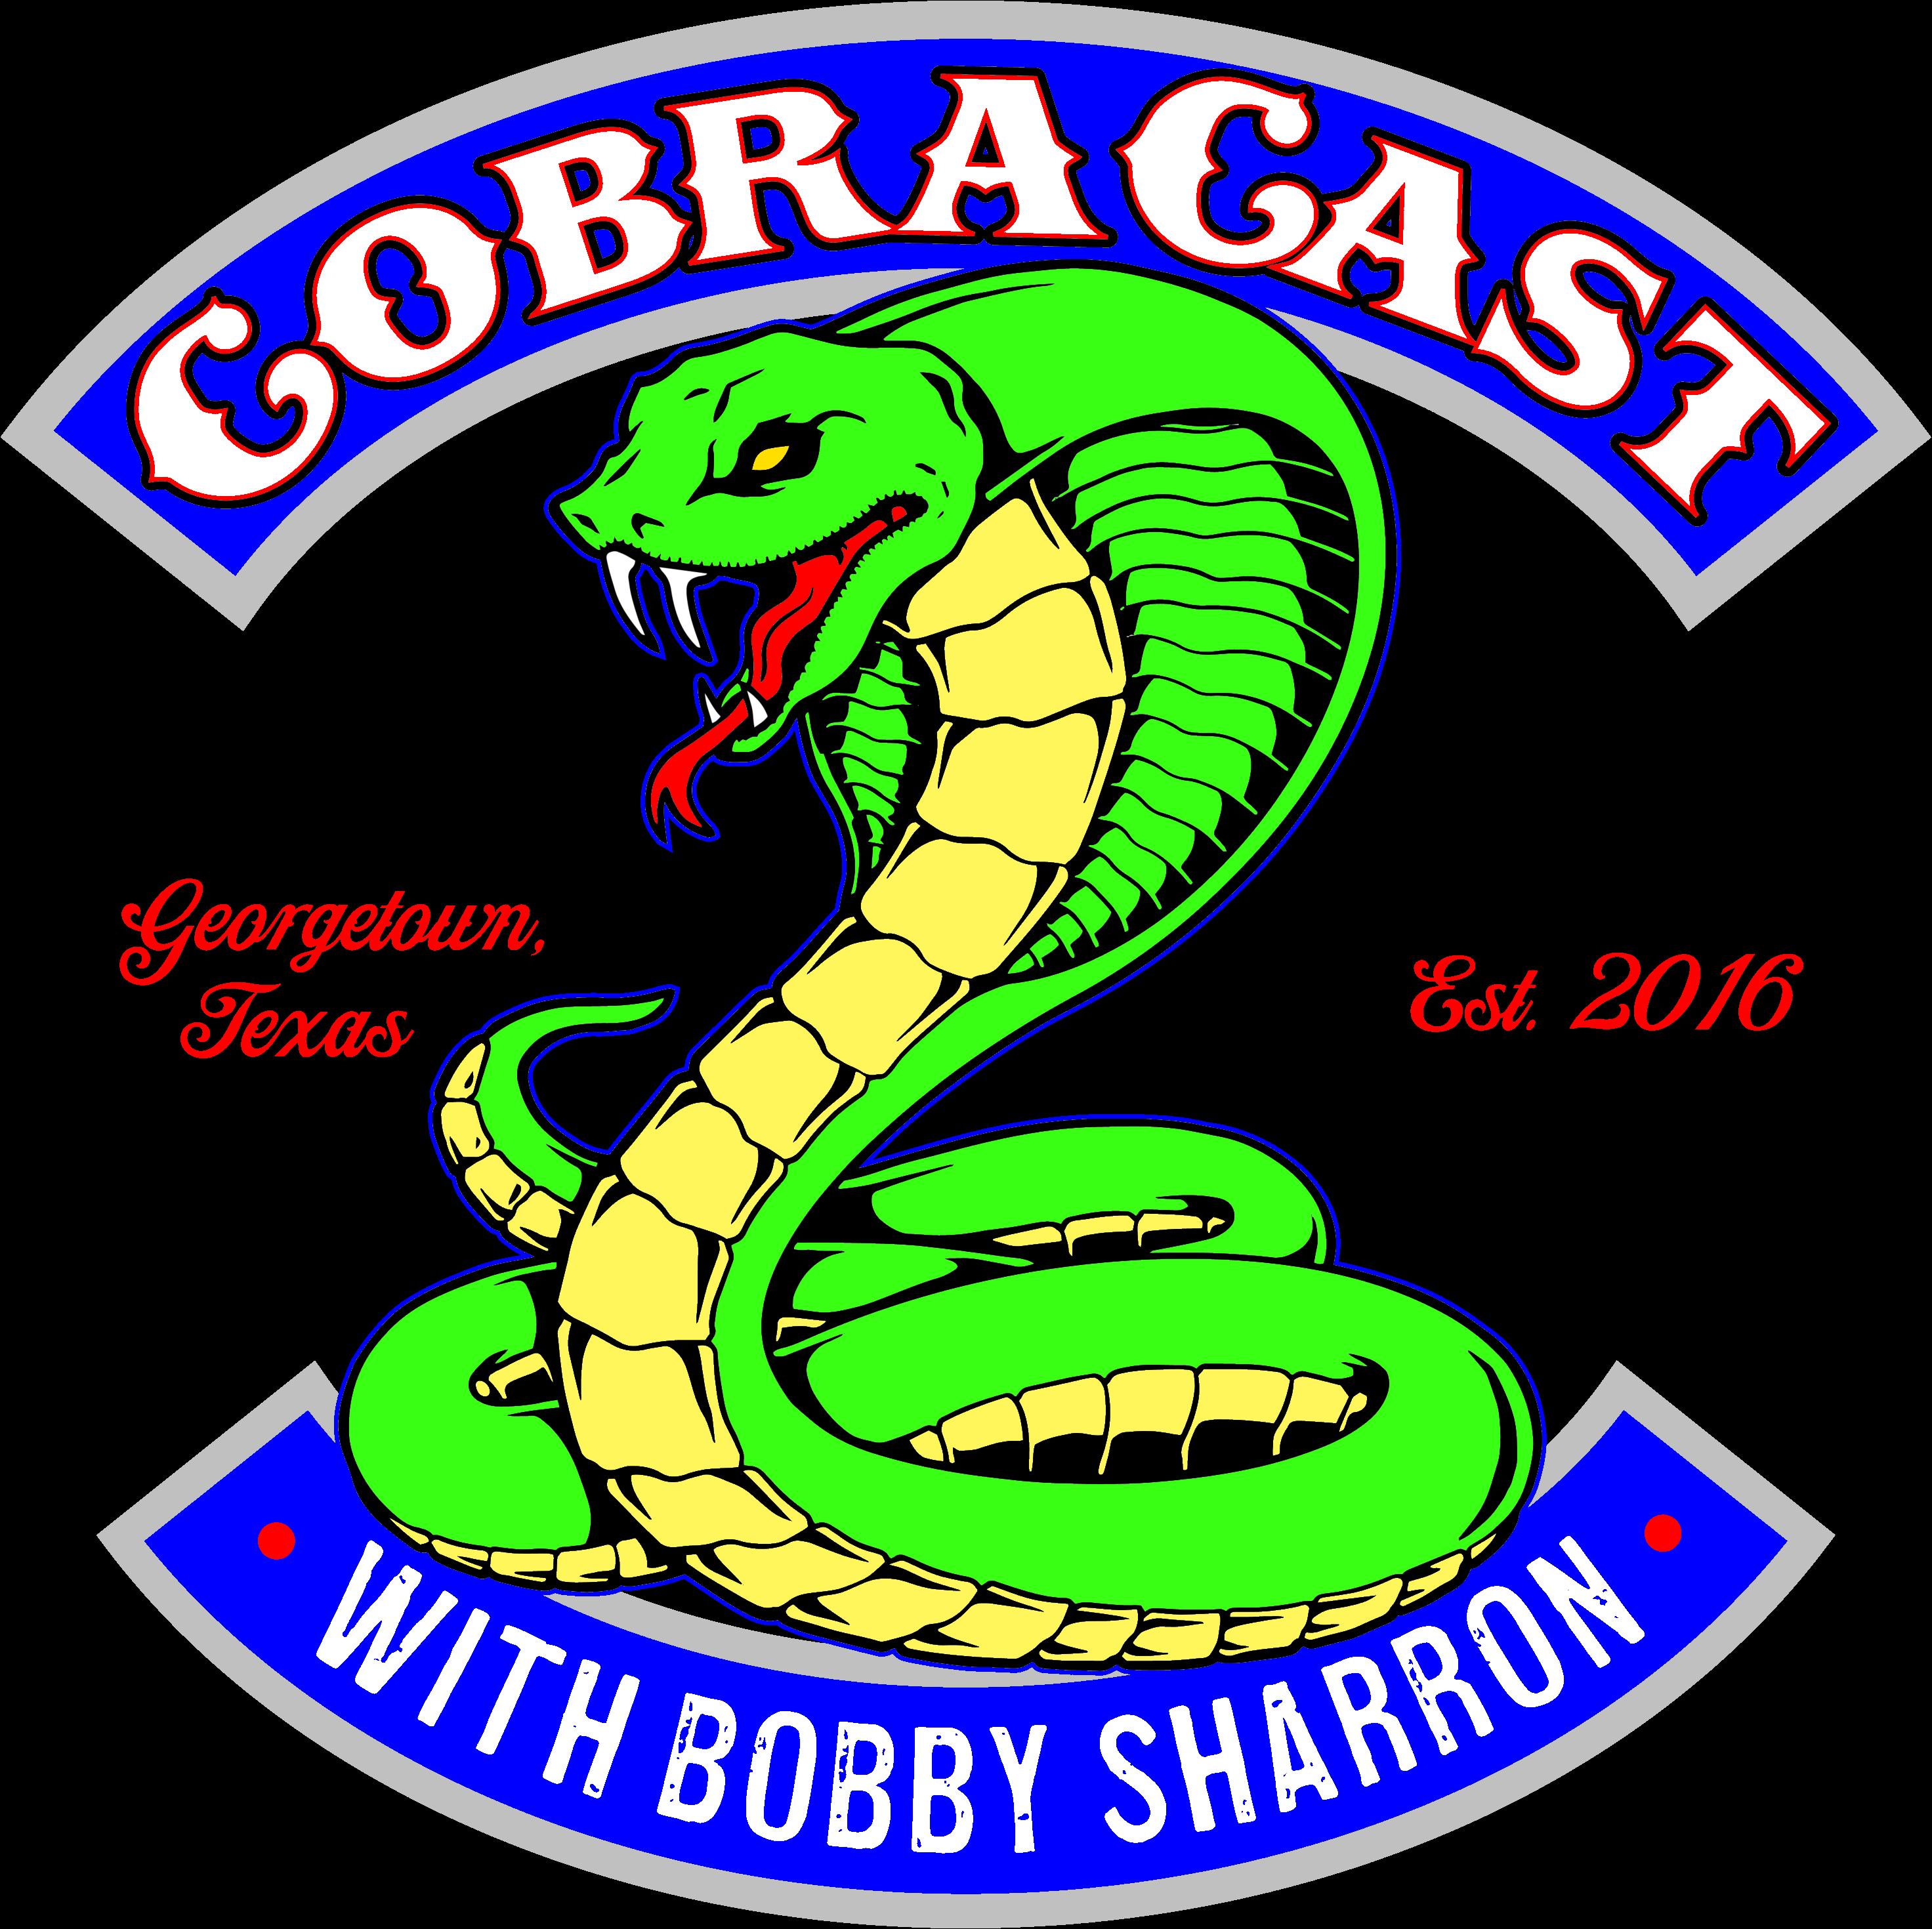 CobraCast Podcast with Bobby Sharron show art